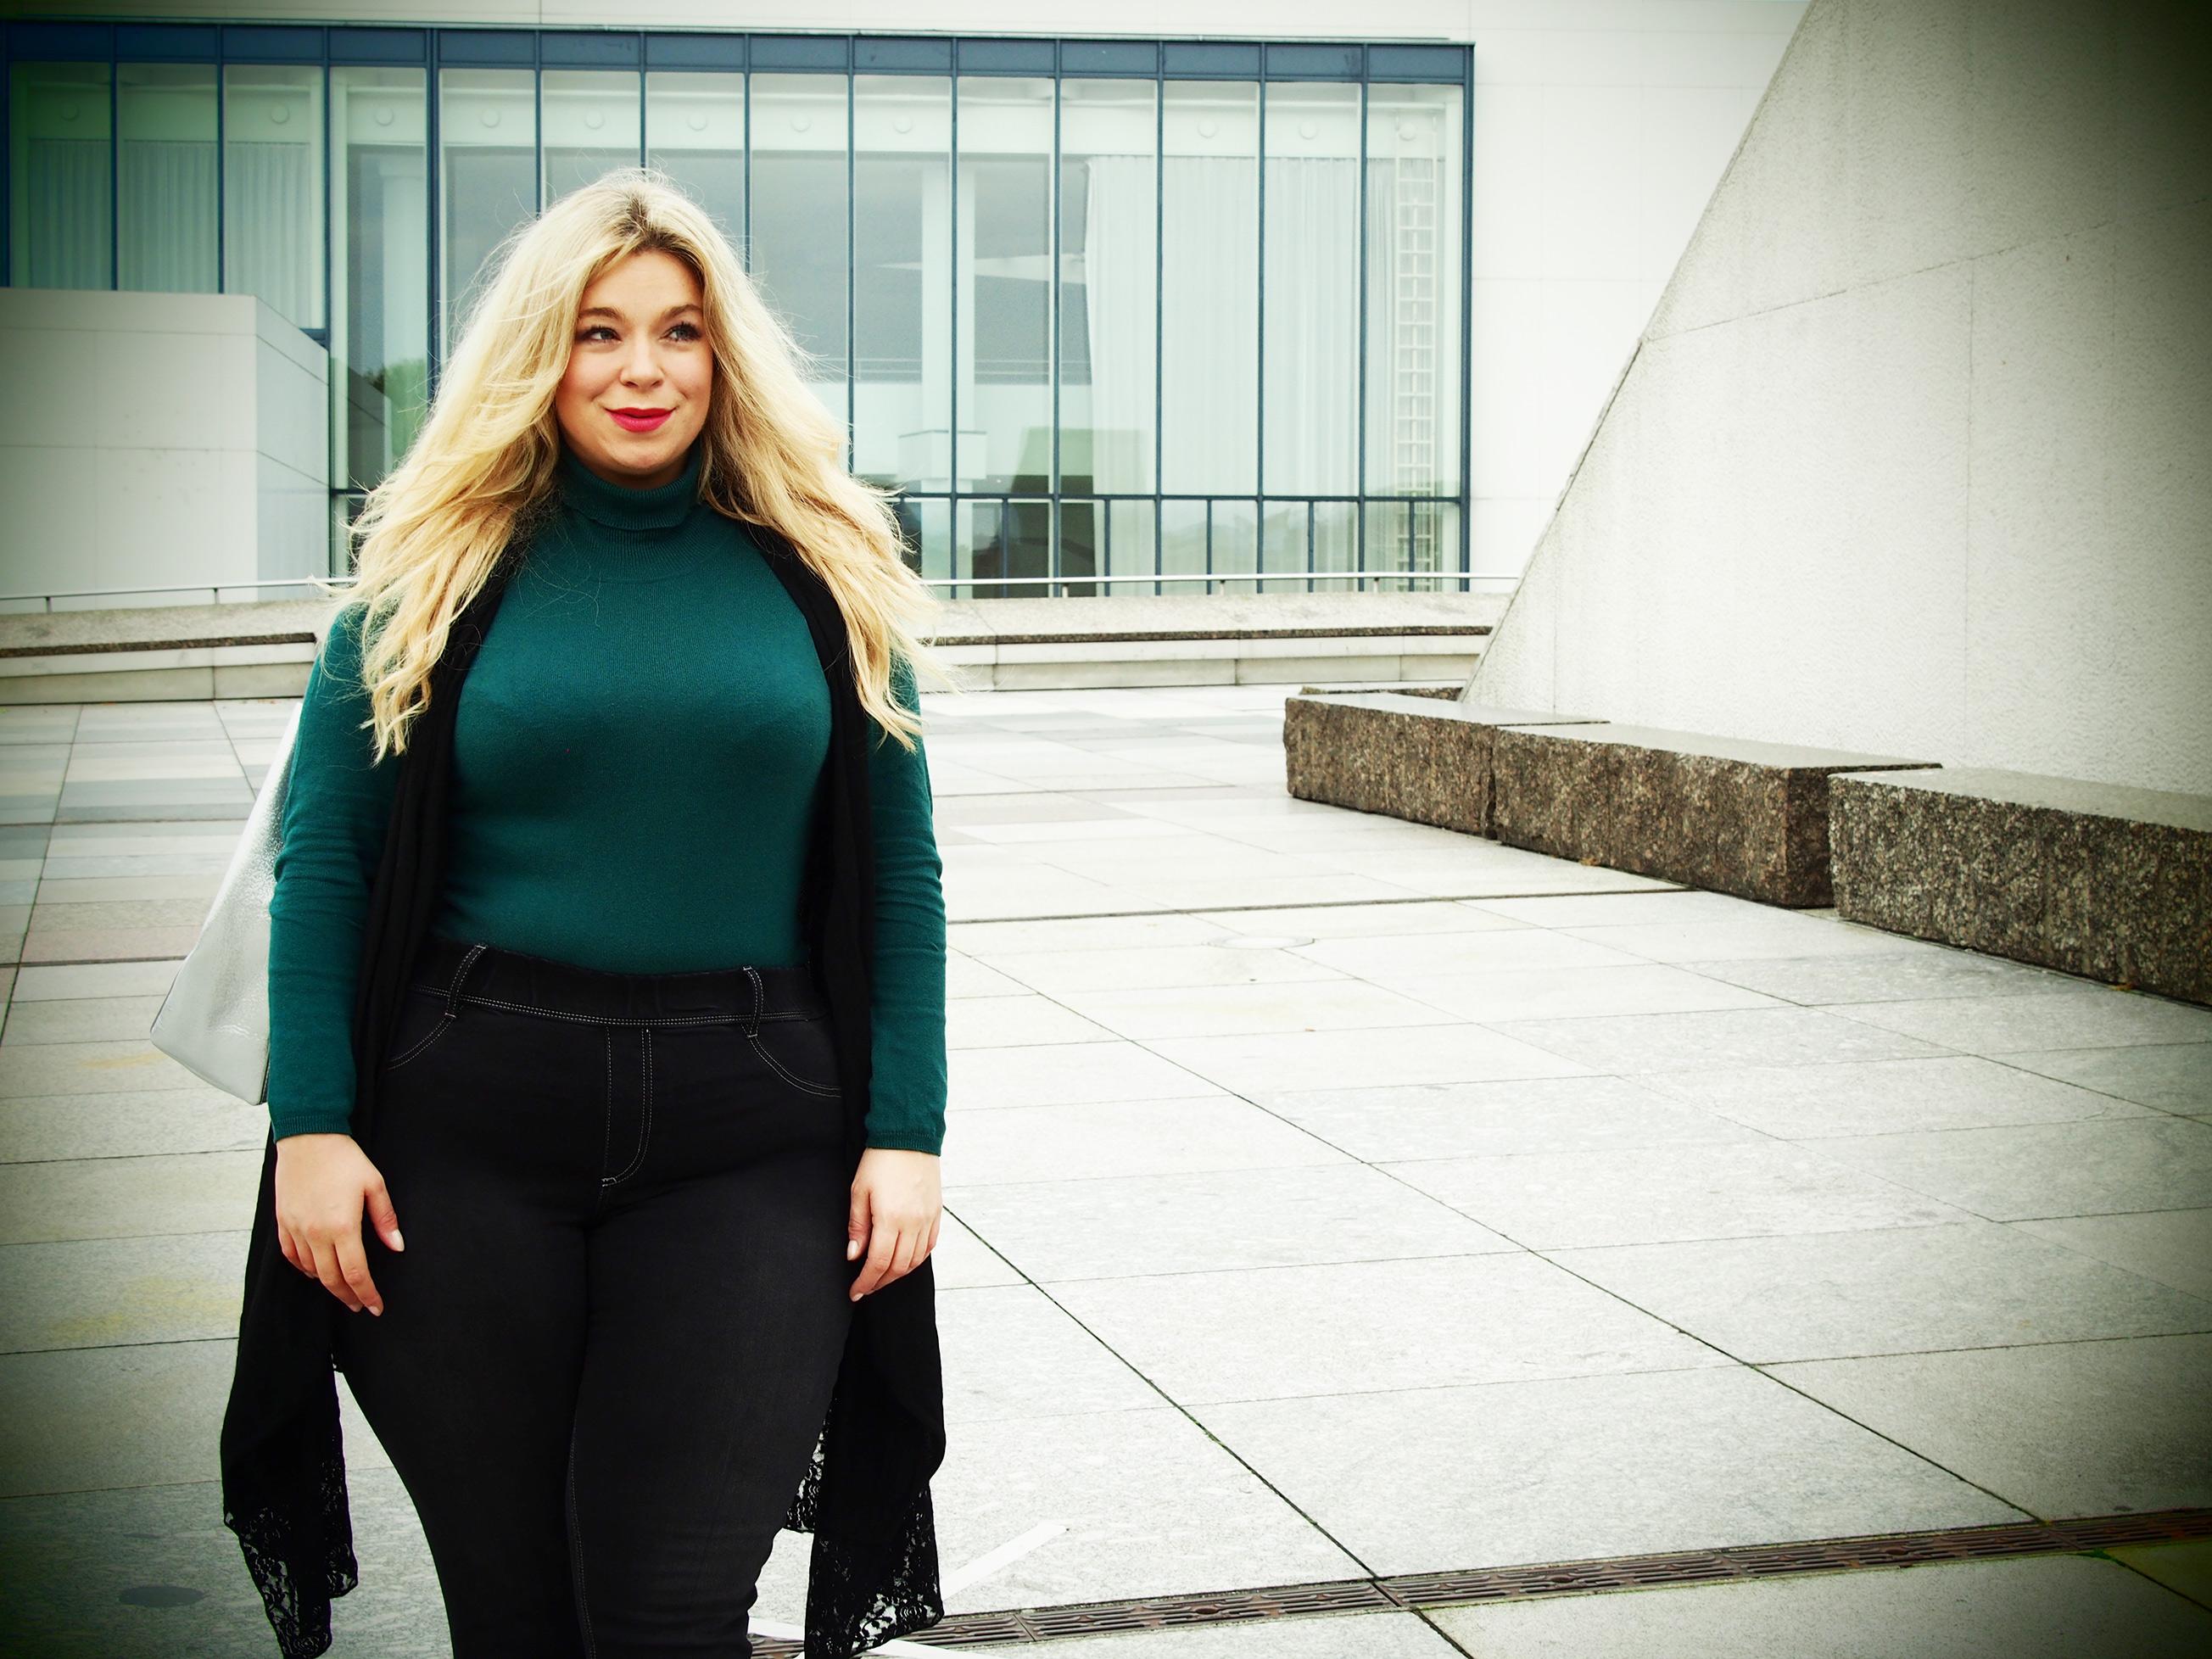 Megabambi-plussize-Caterina-pogorzelski-Plusiszeblogger-plusiszeoutfit-große-größe